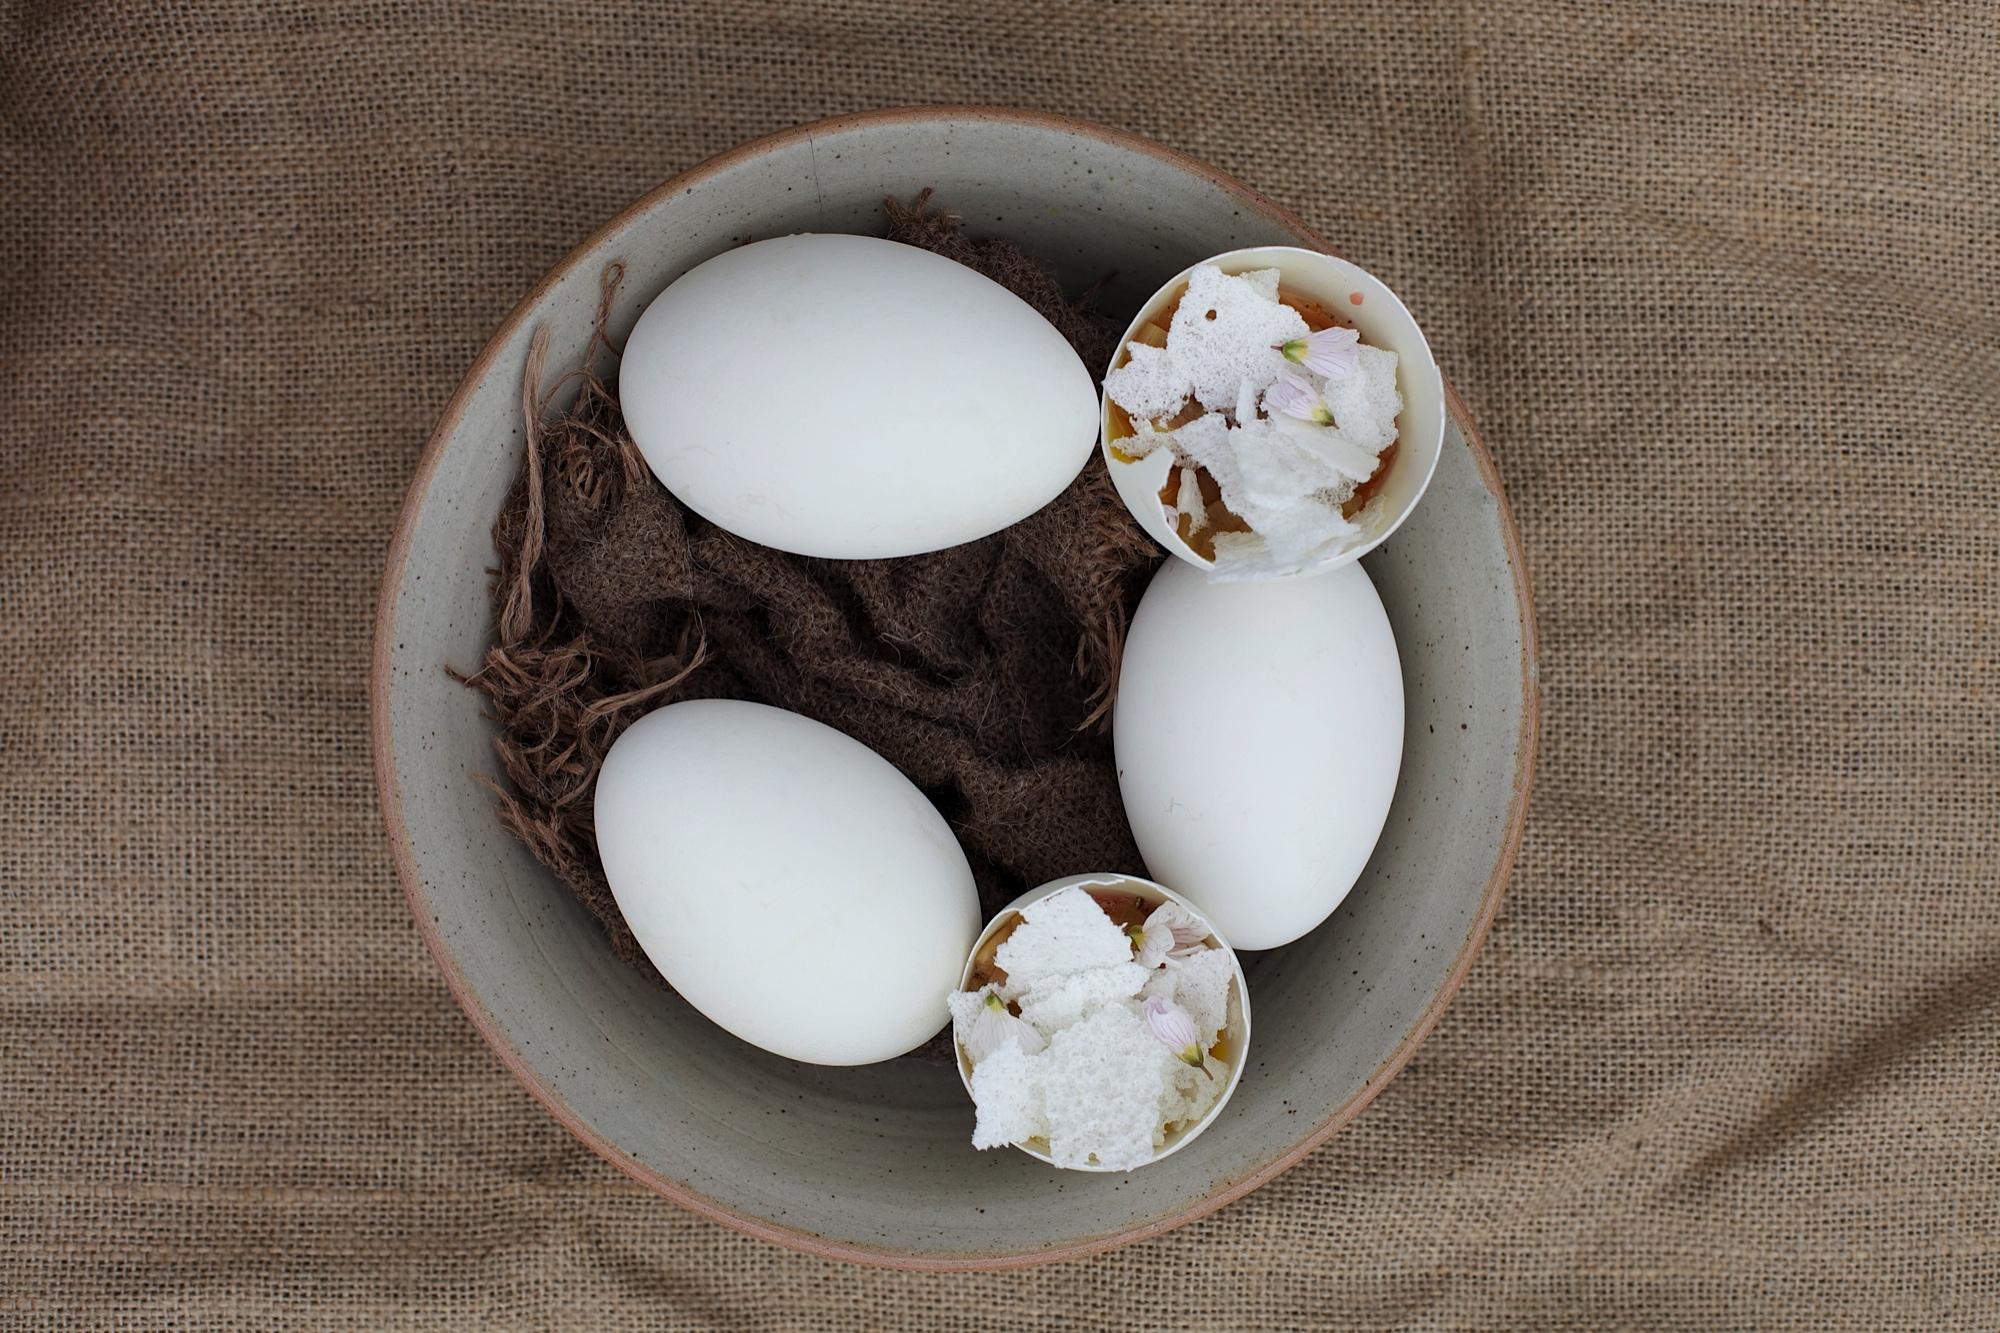 Duck egg, rhubarb, wood sorrel